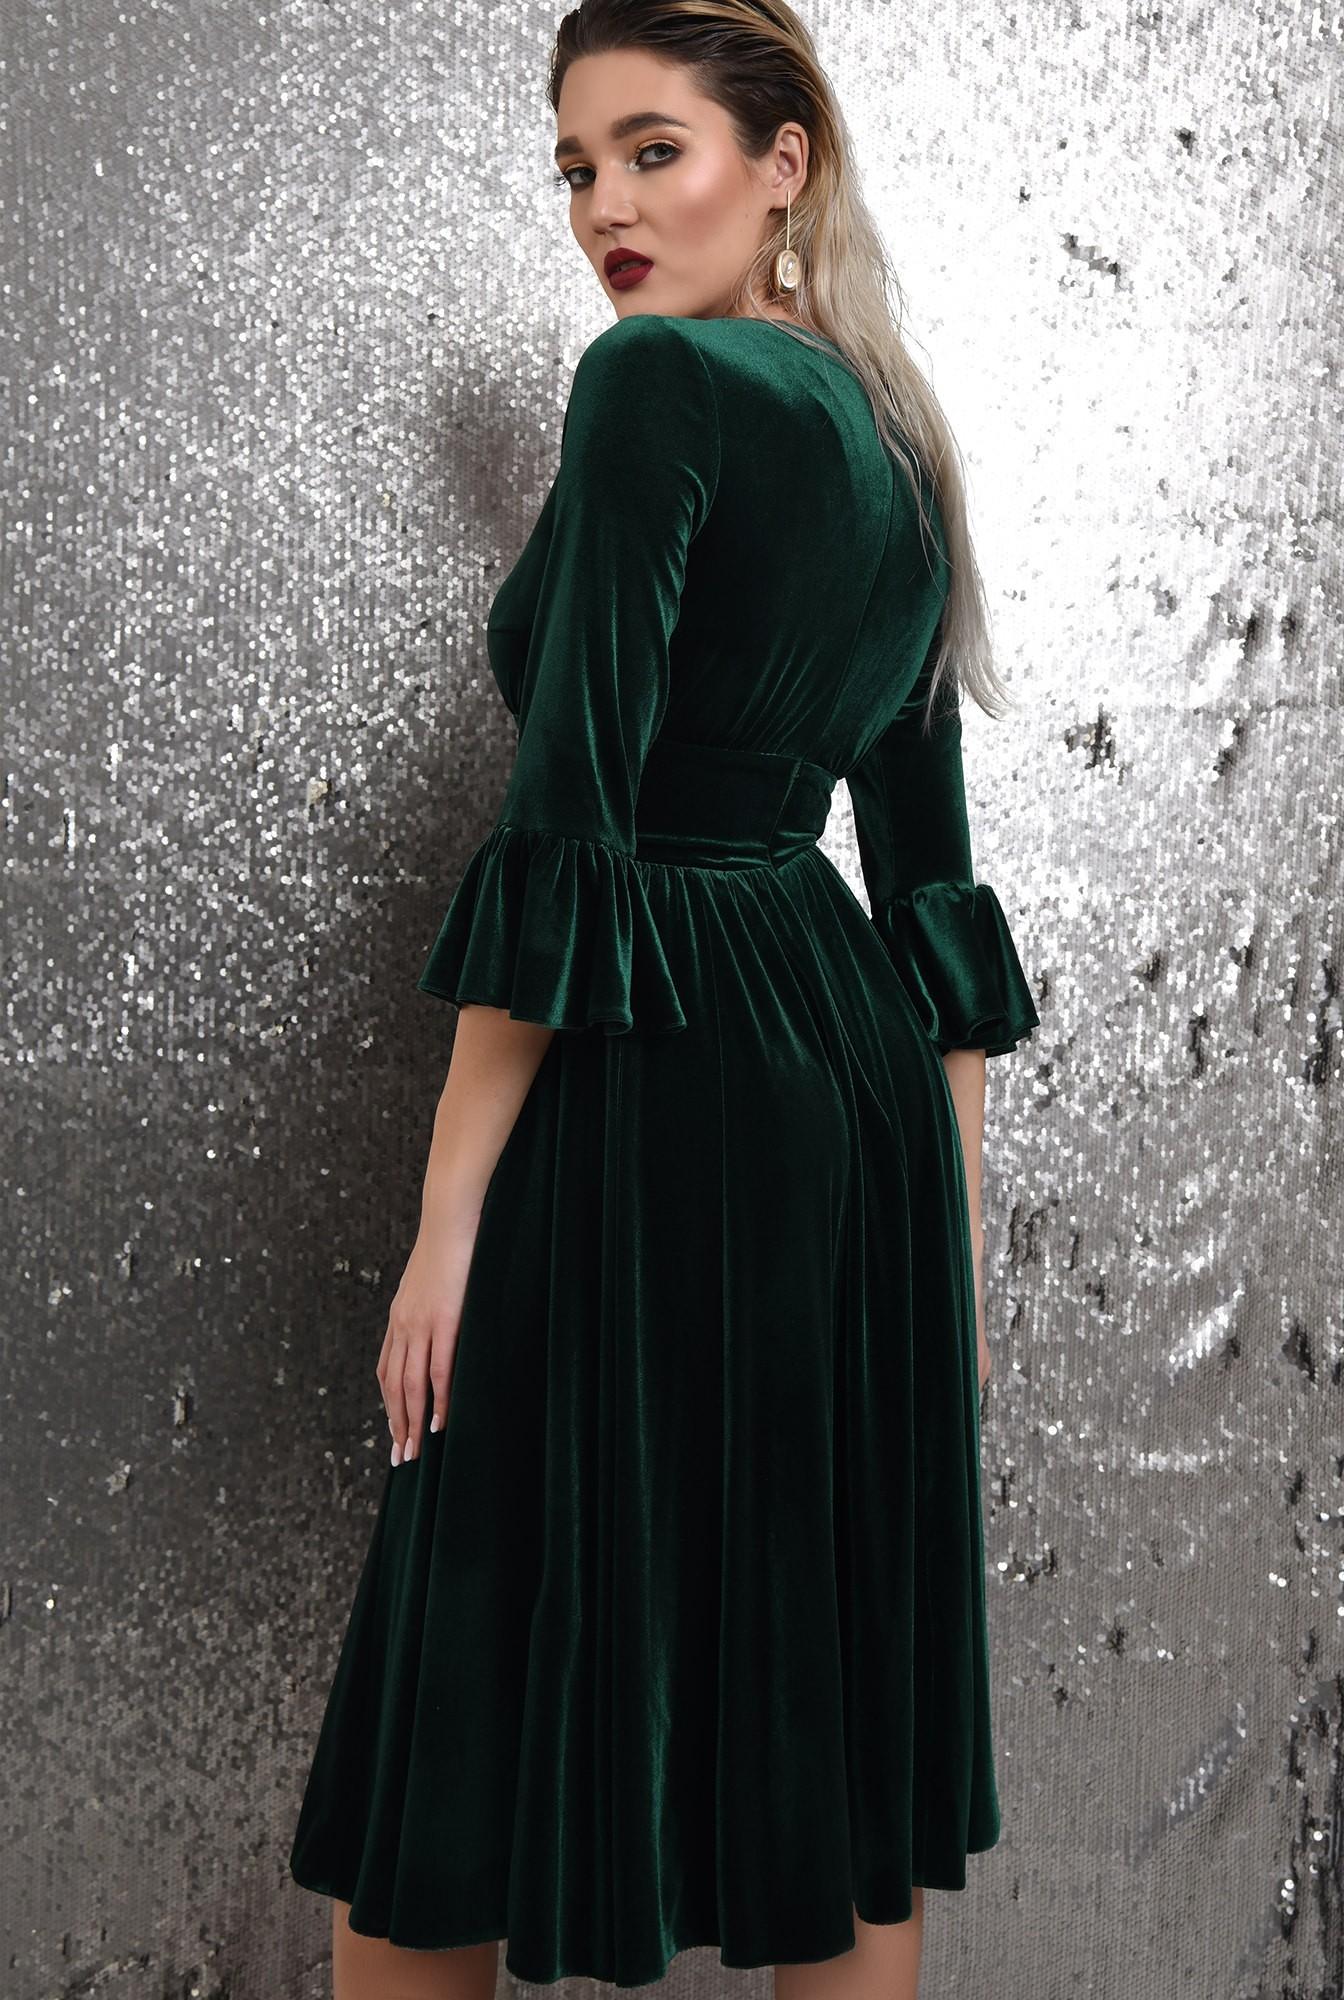 1 -  360 - rochie verde, midi, clos, catifea, maneci peplum, Poema